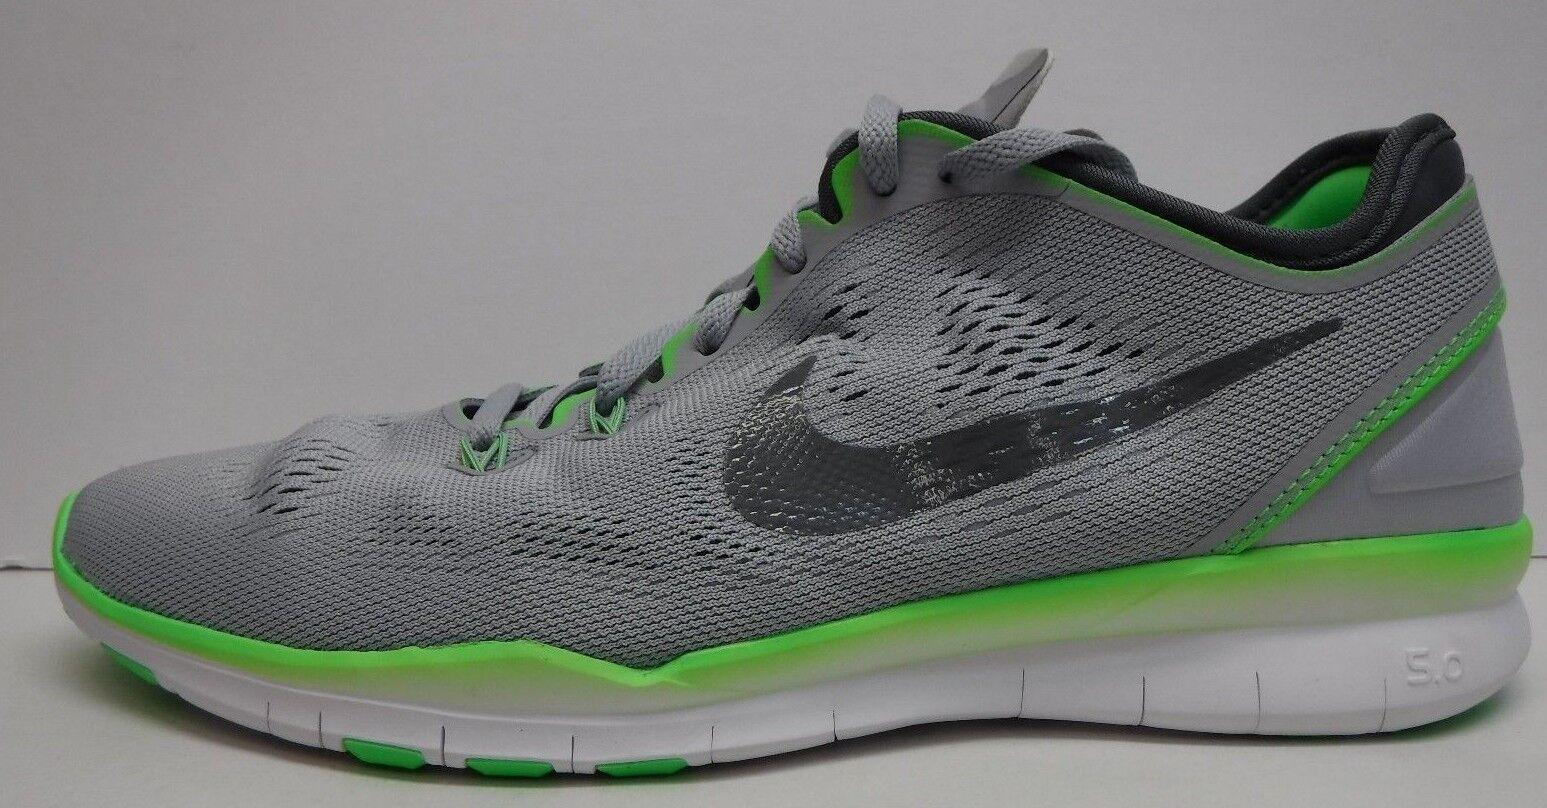 Nike Größe 8 Training Sneakers New Damenschuhe Damenschuhe Damenschuhe Schuhes 6b194d